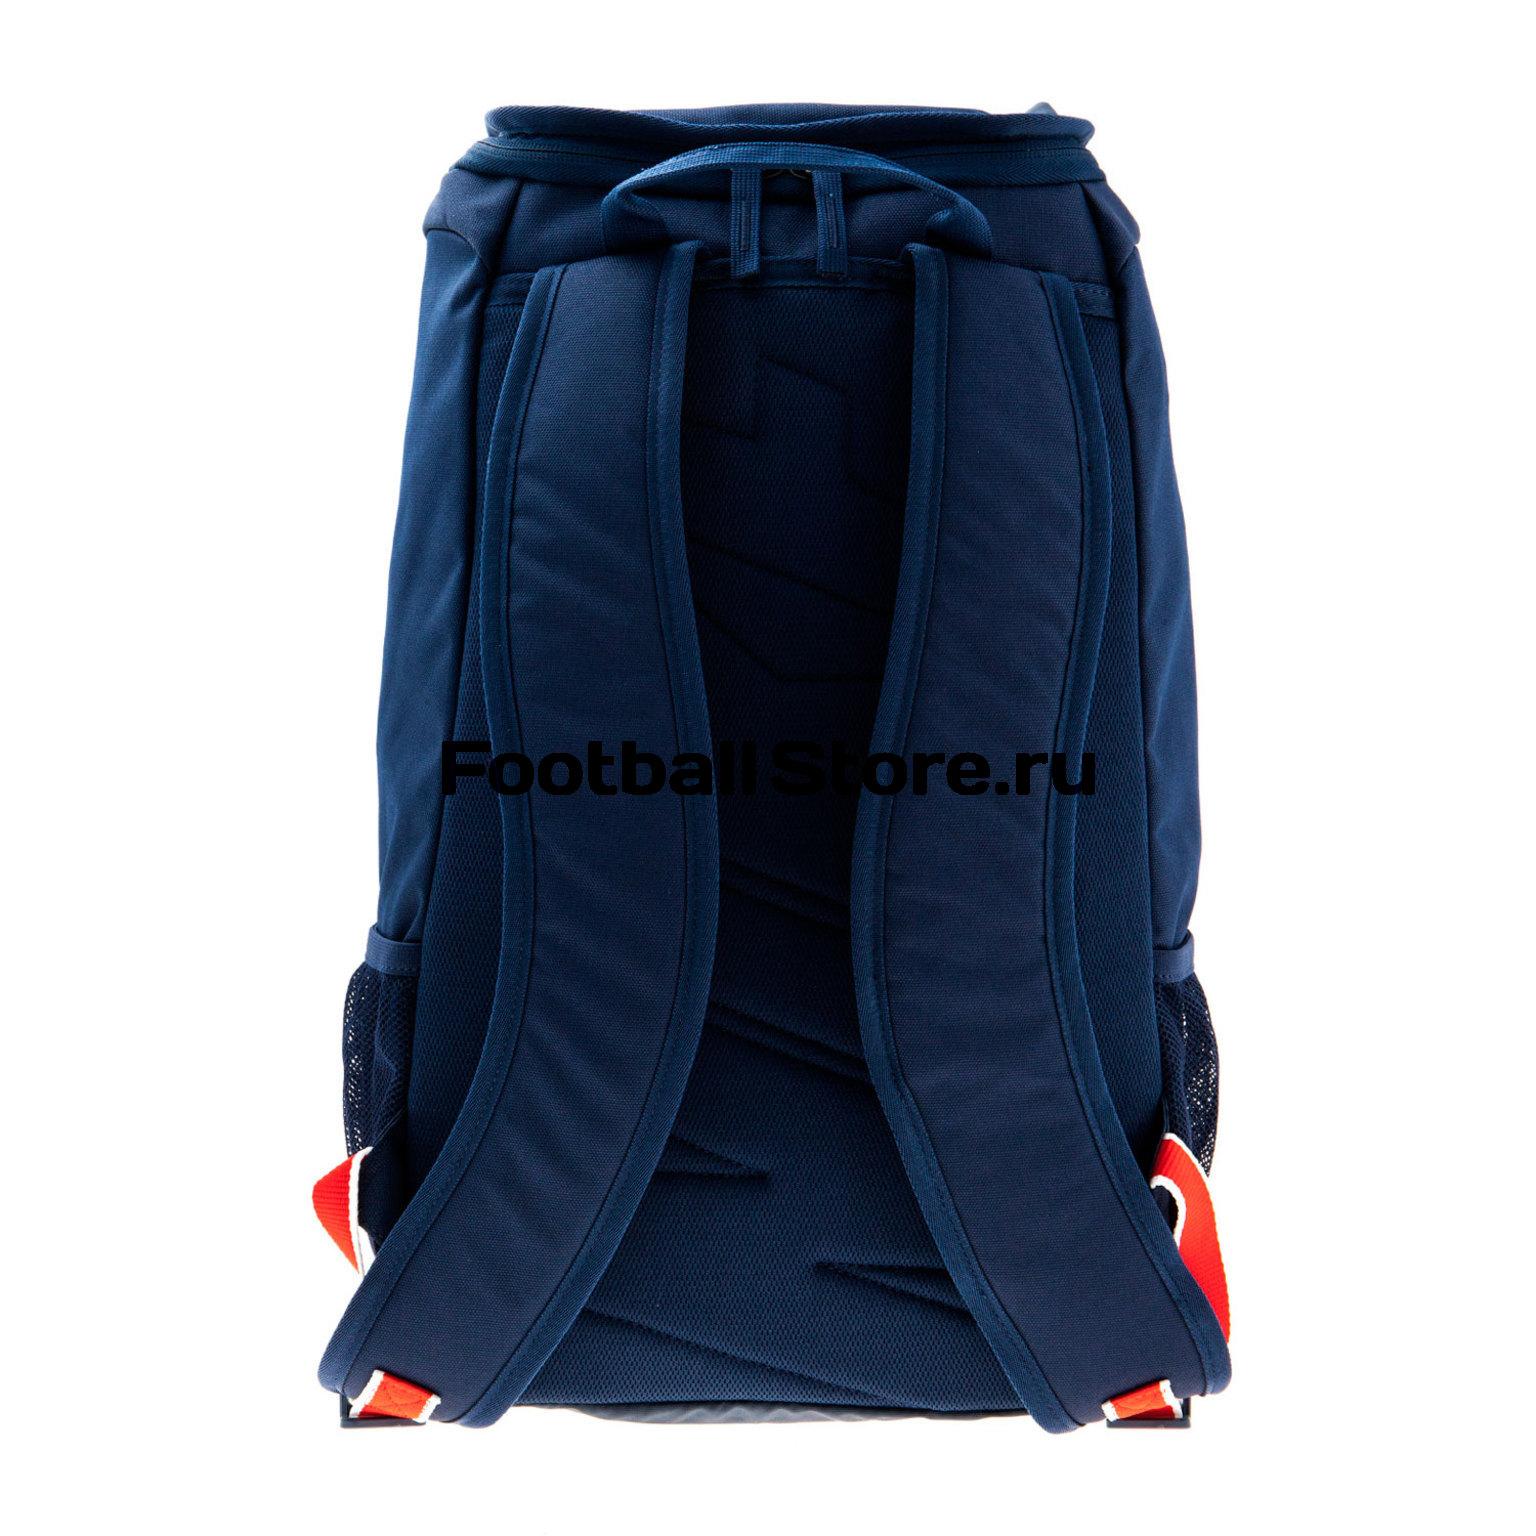 00429493d7f95 Рюкзак Nike Allegiance PSG Shield Compact BA5039-411 - купить в ...